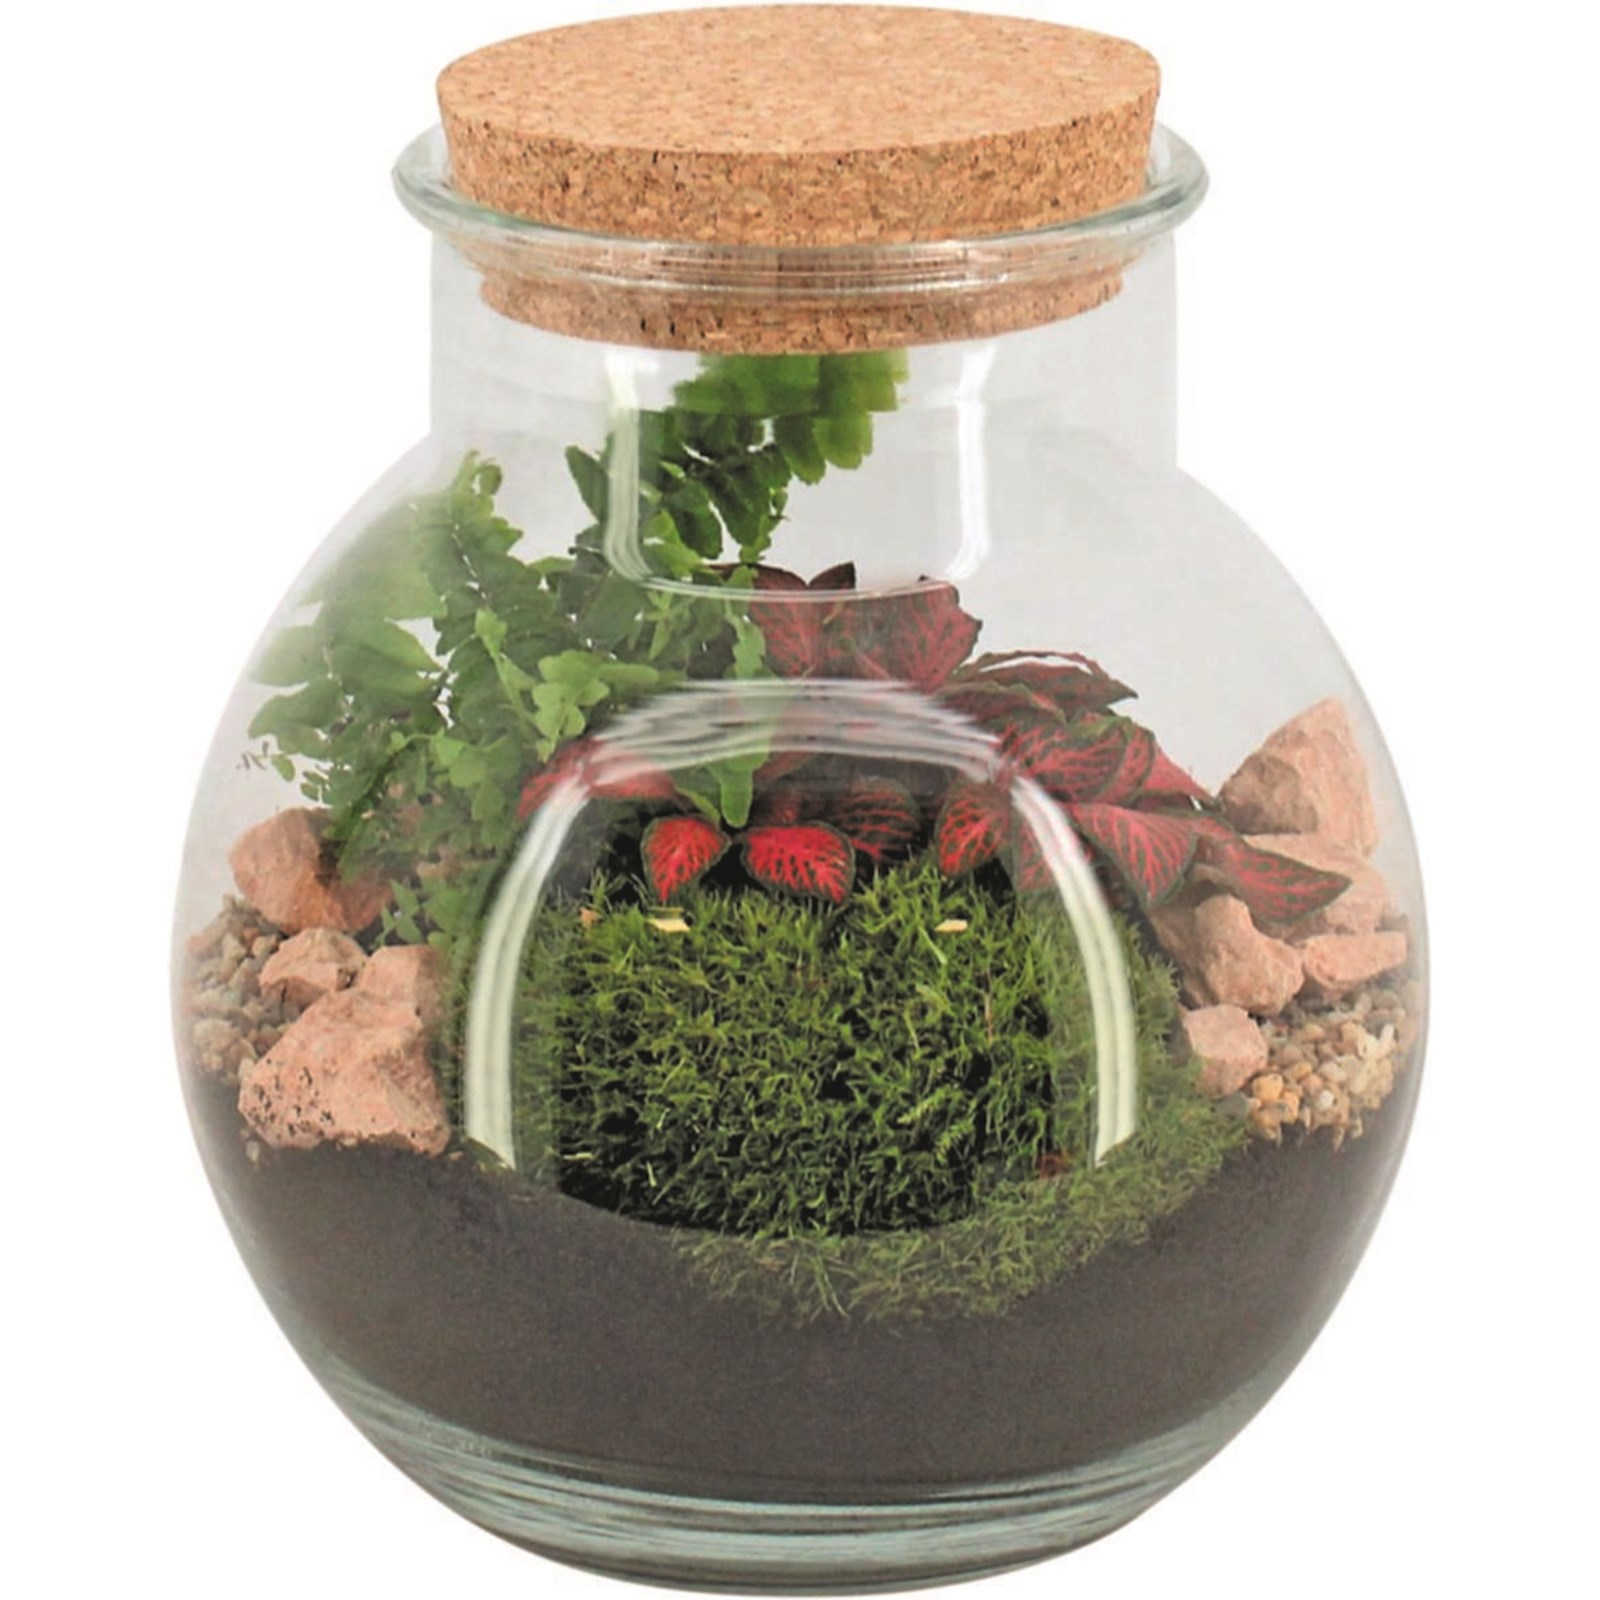 Indoor Mini Garten P16 Cm Zimmerpflanzen Landi